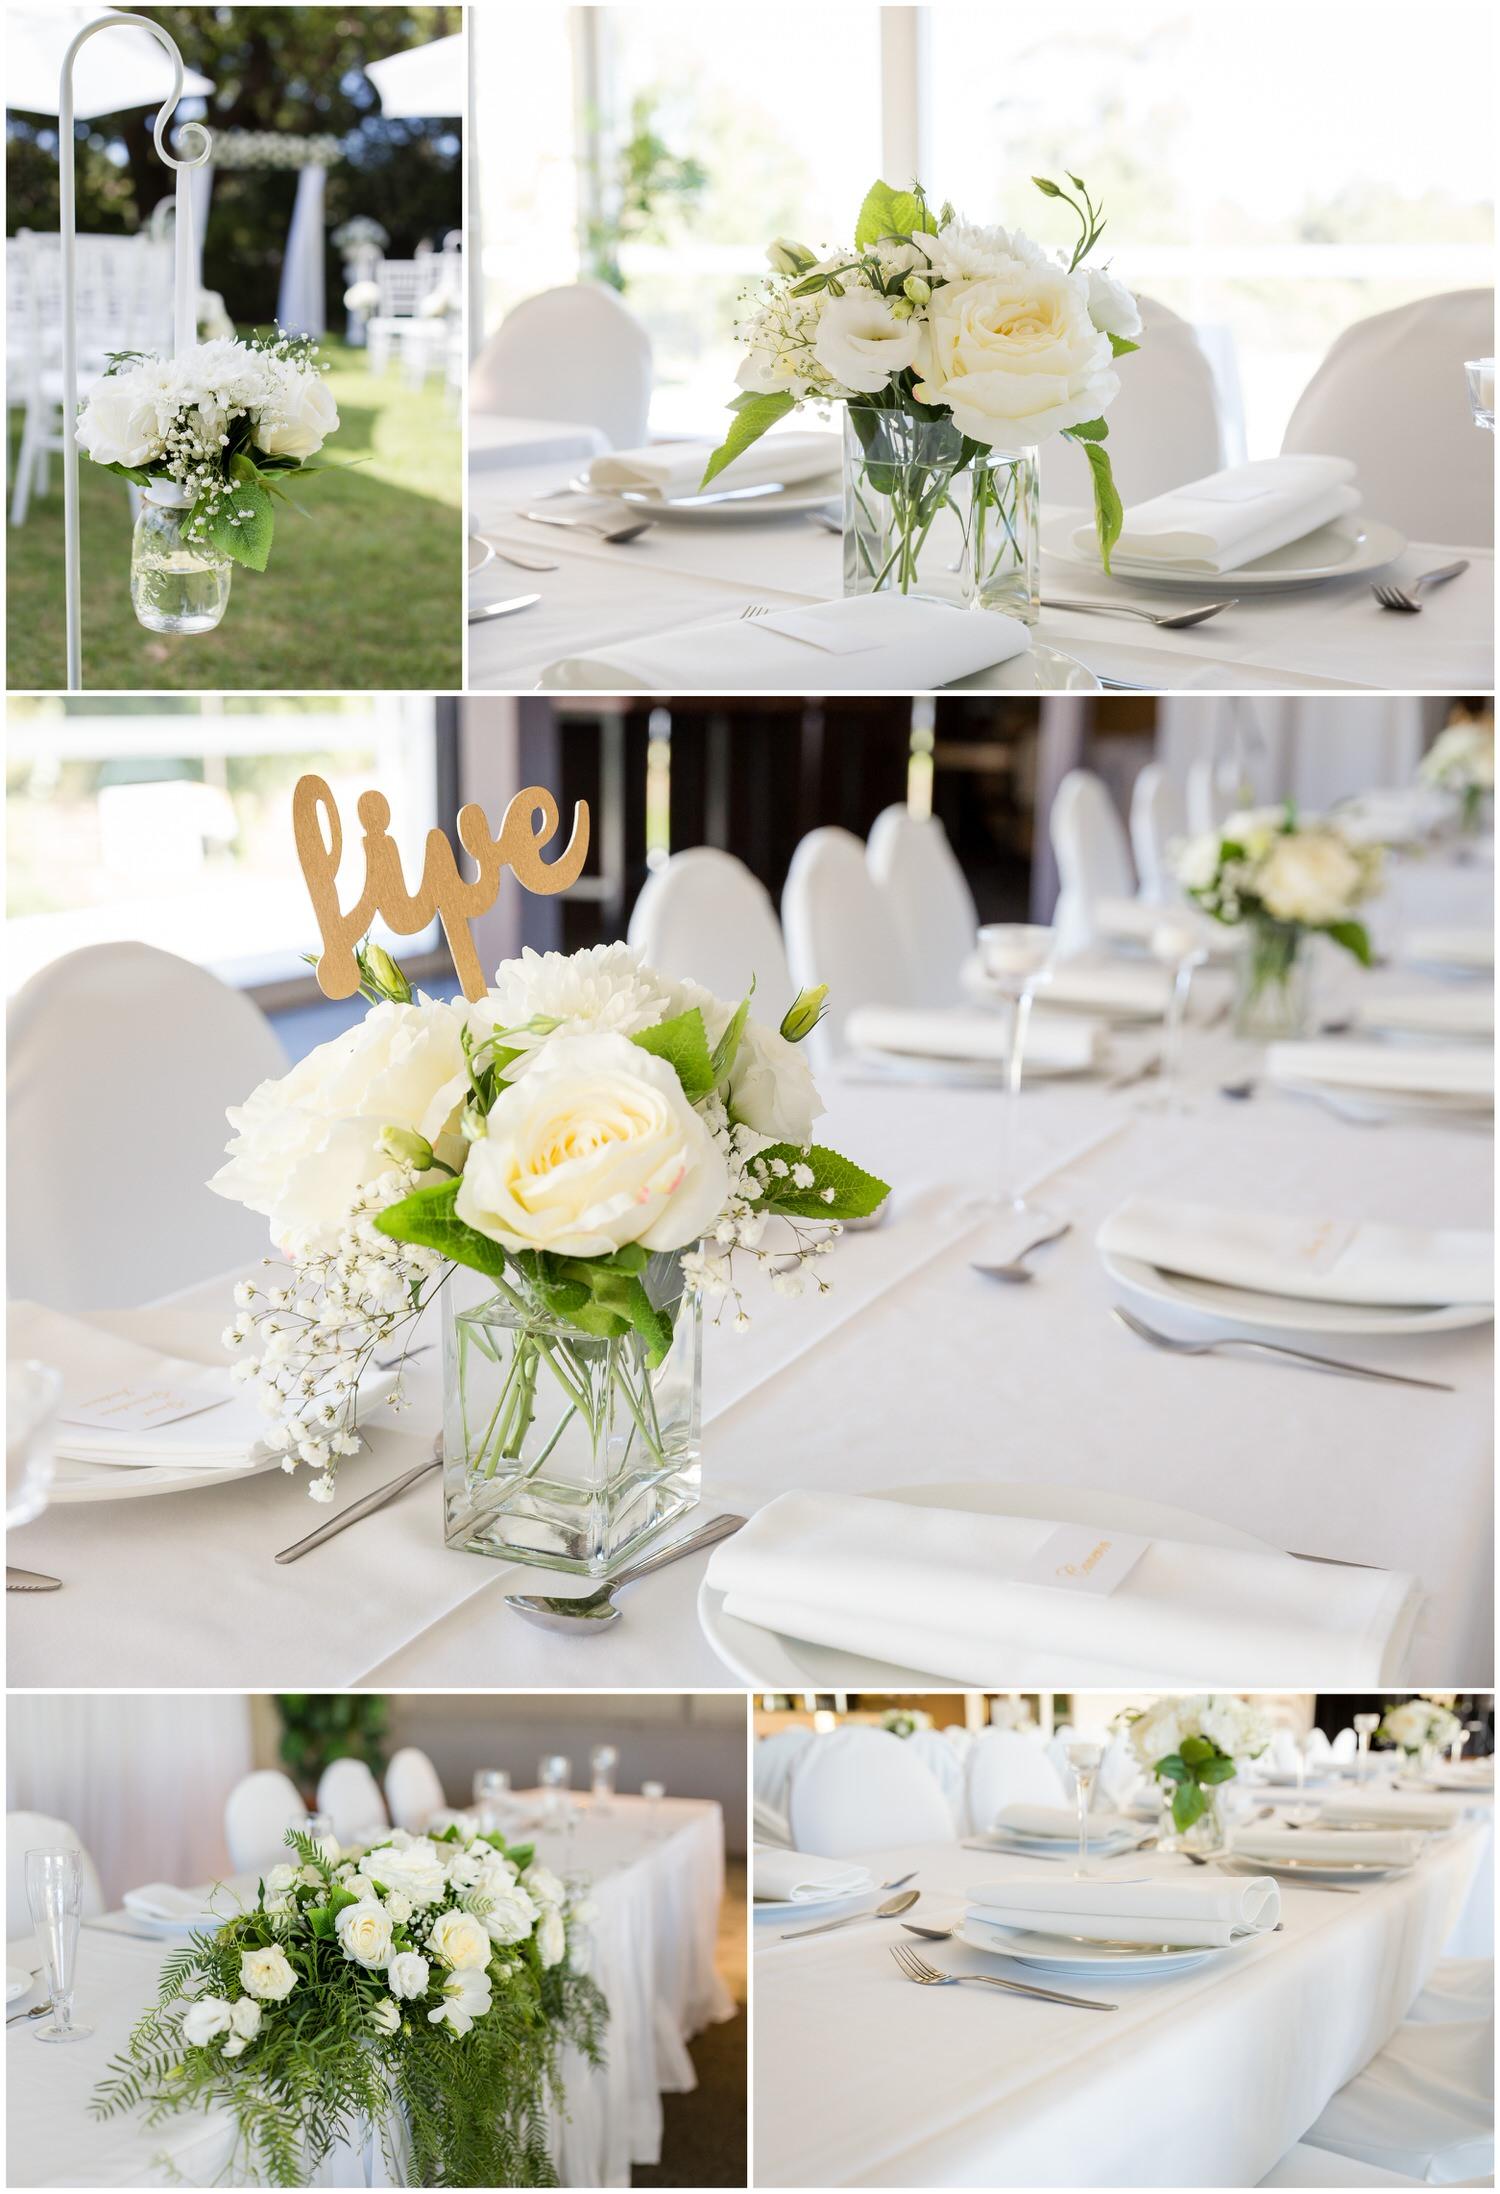 Dubbo Wedding Photography - Taylormade  14